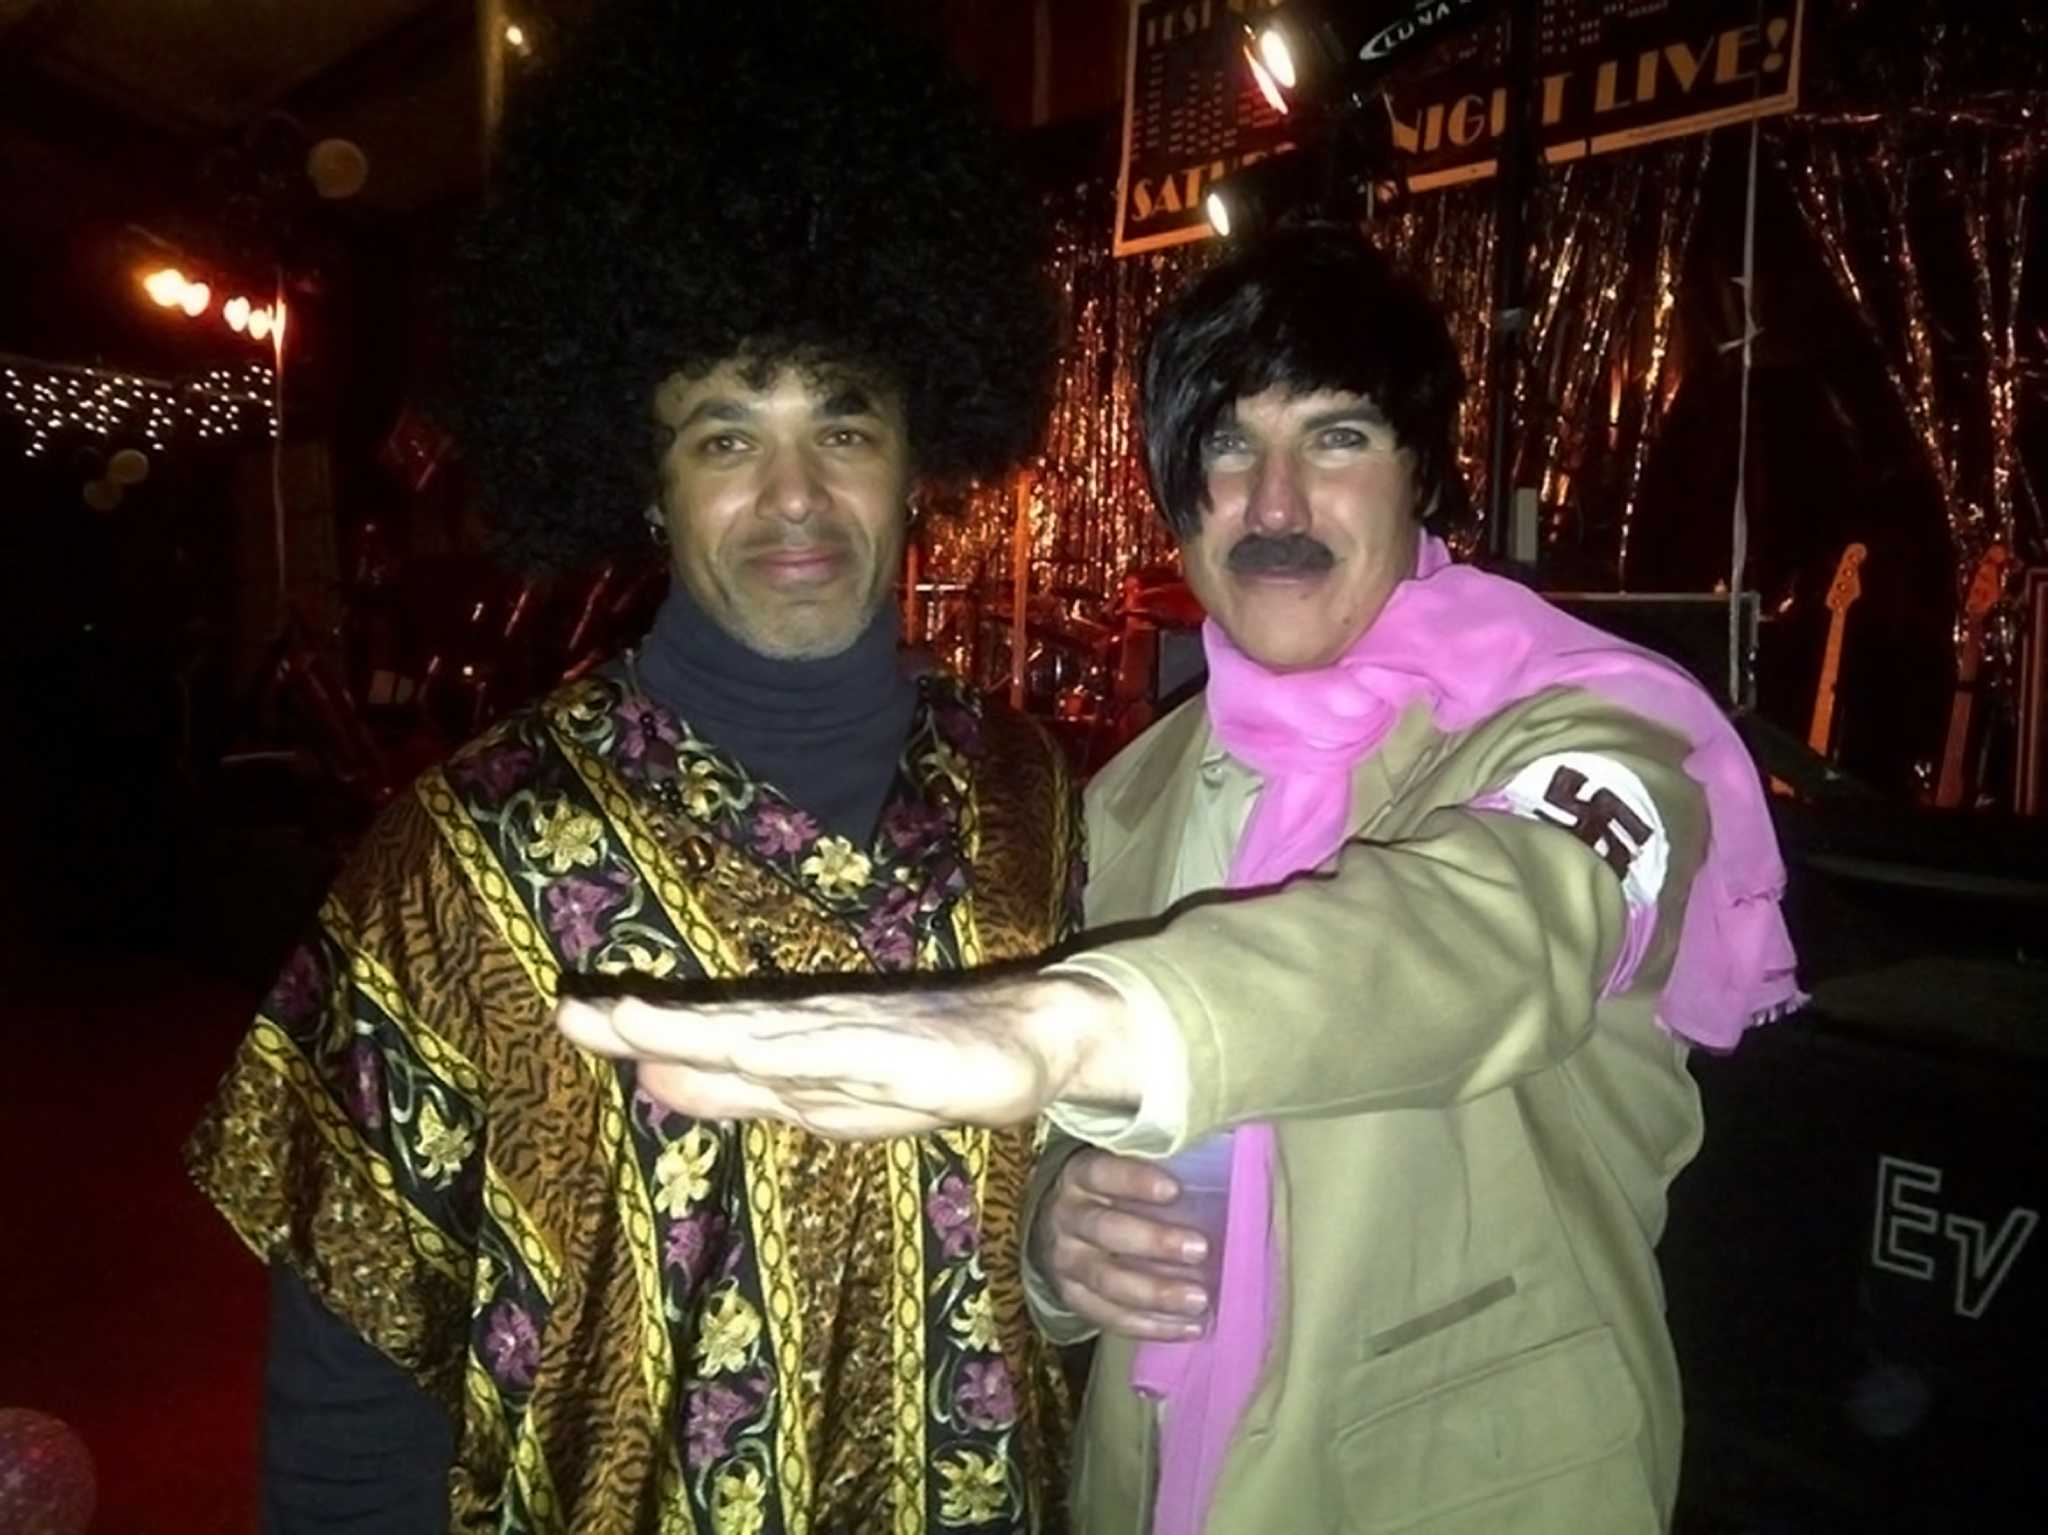 GOP Texas House candidate dressed as Gay Hitler San Antonio